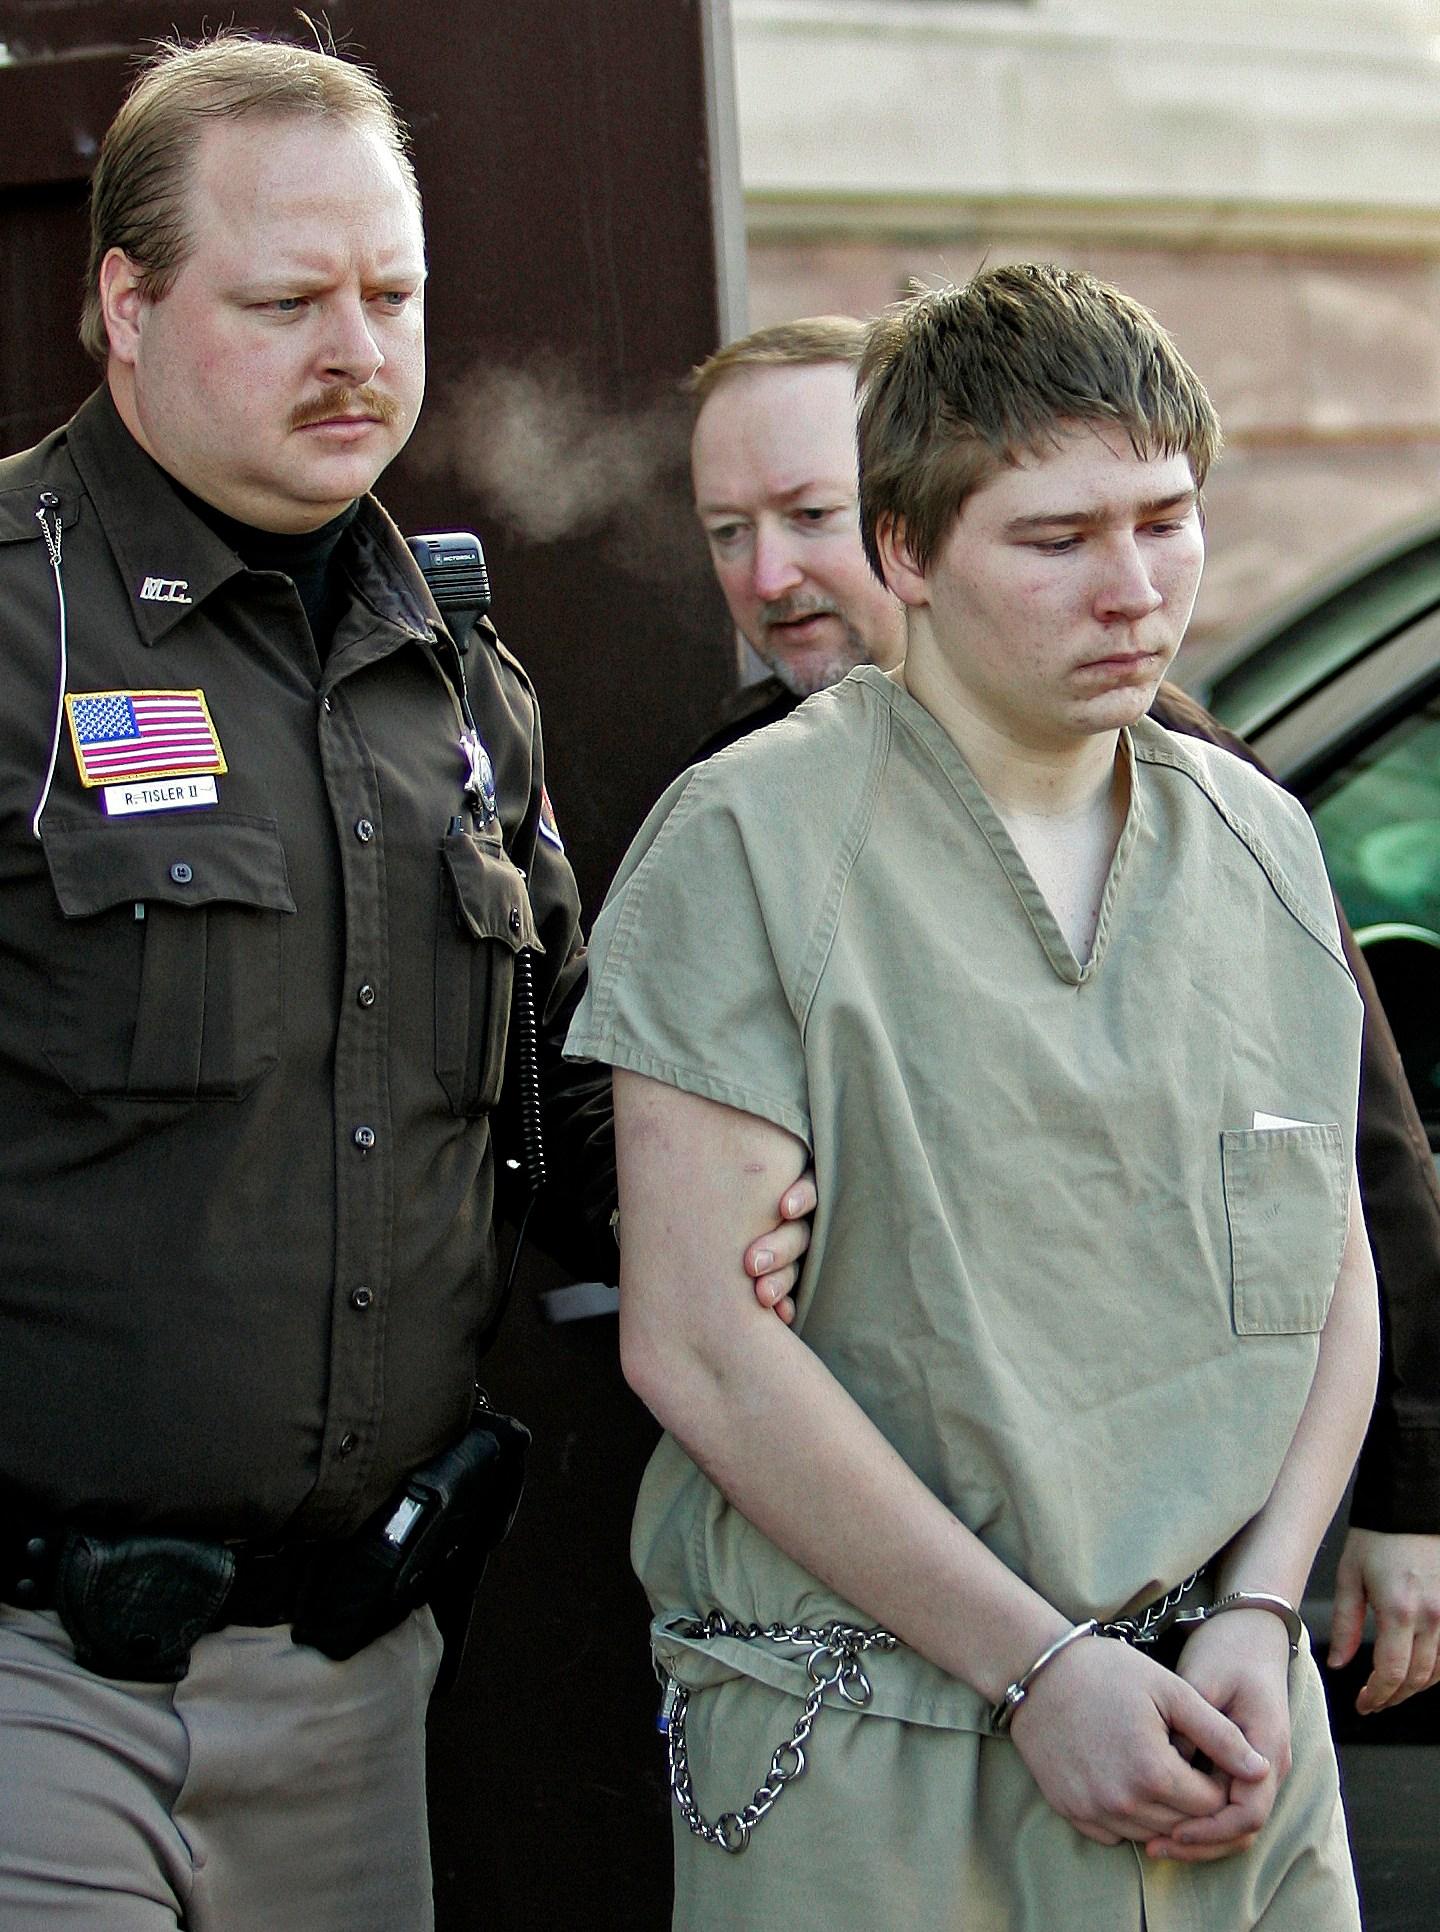 Brendan Dassey Photo by Morry Gash, AP Photo_243186